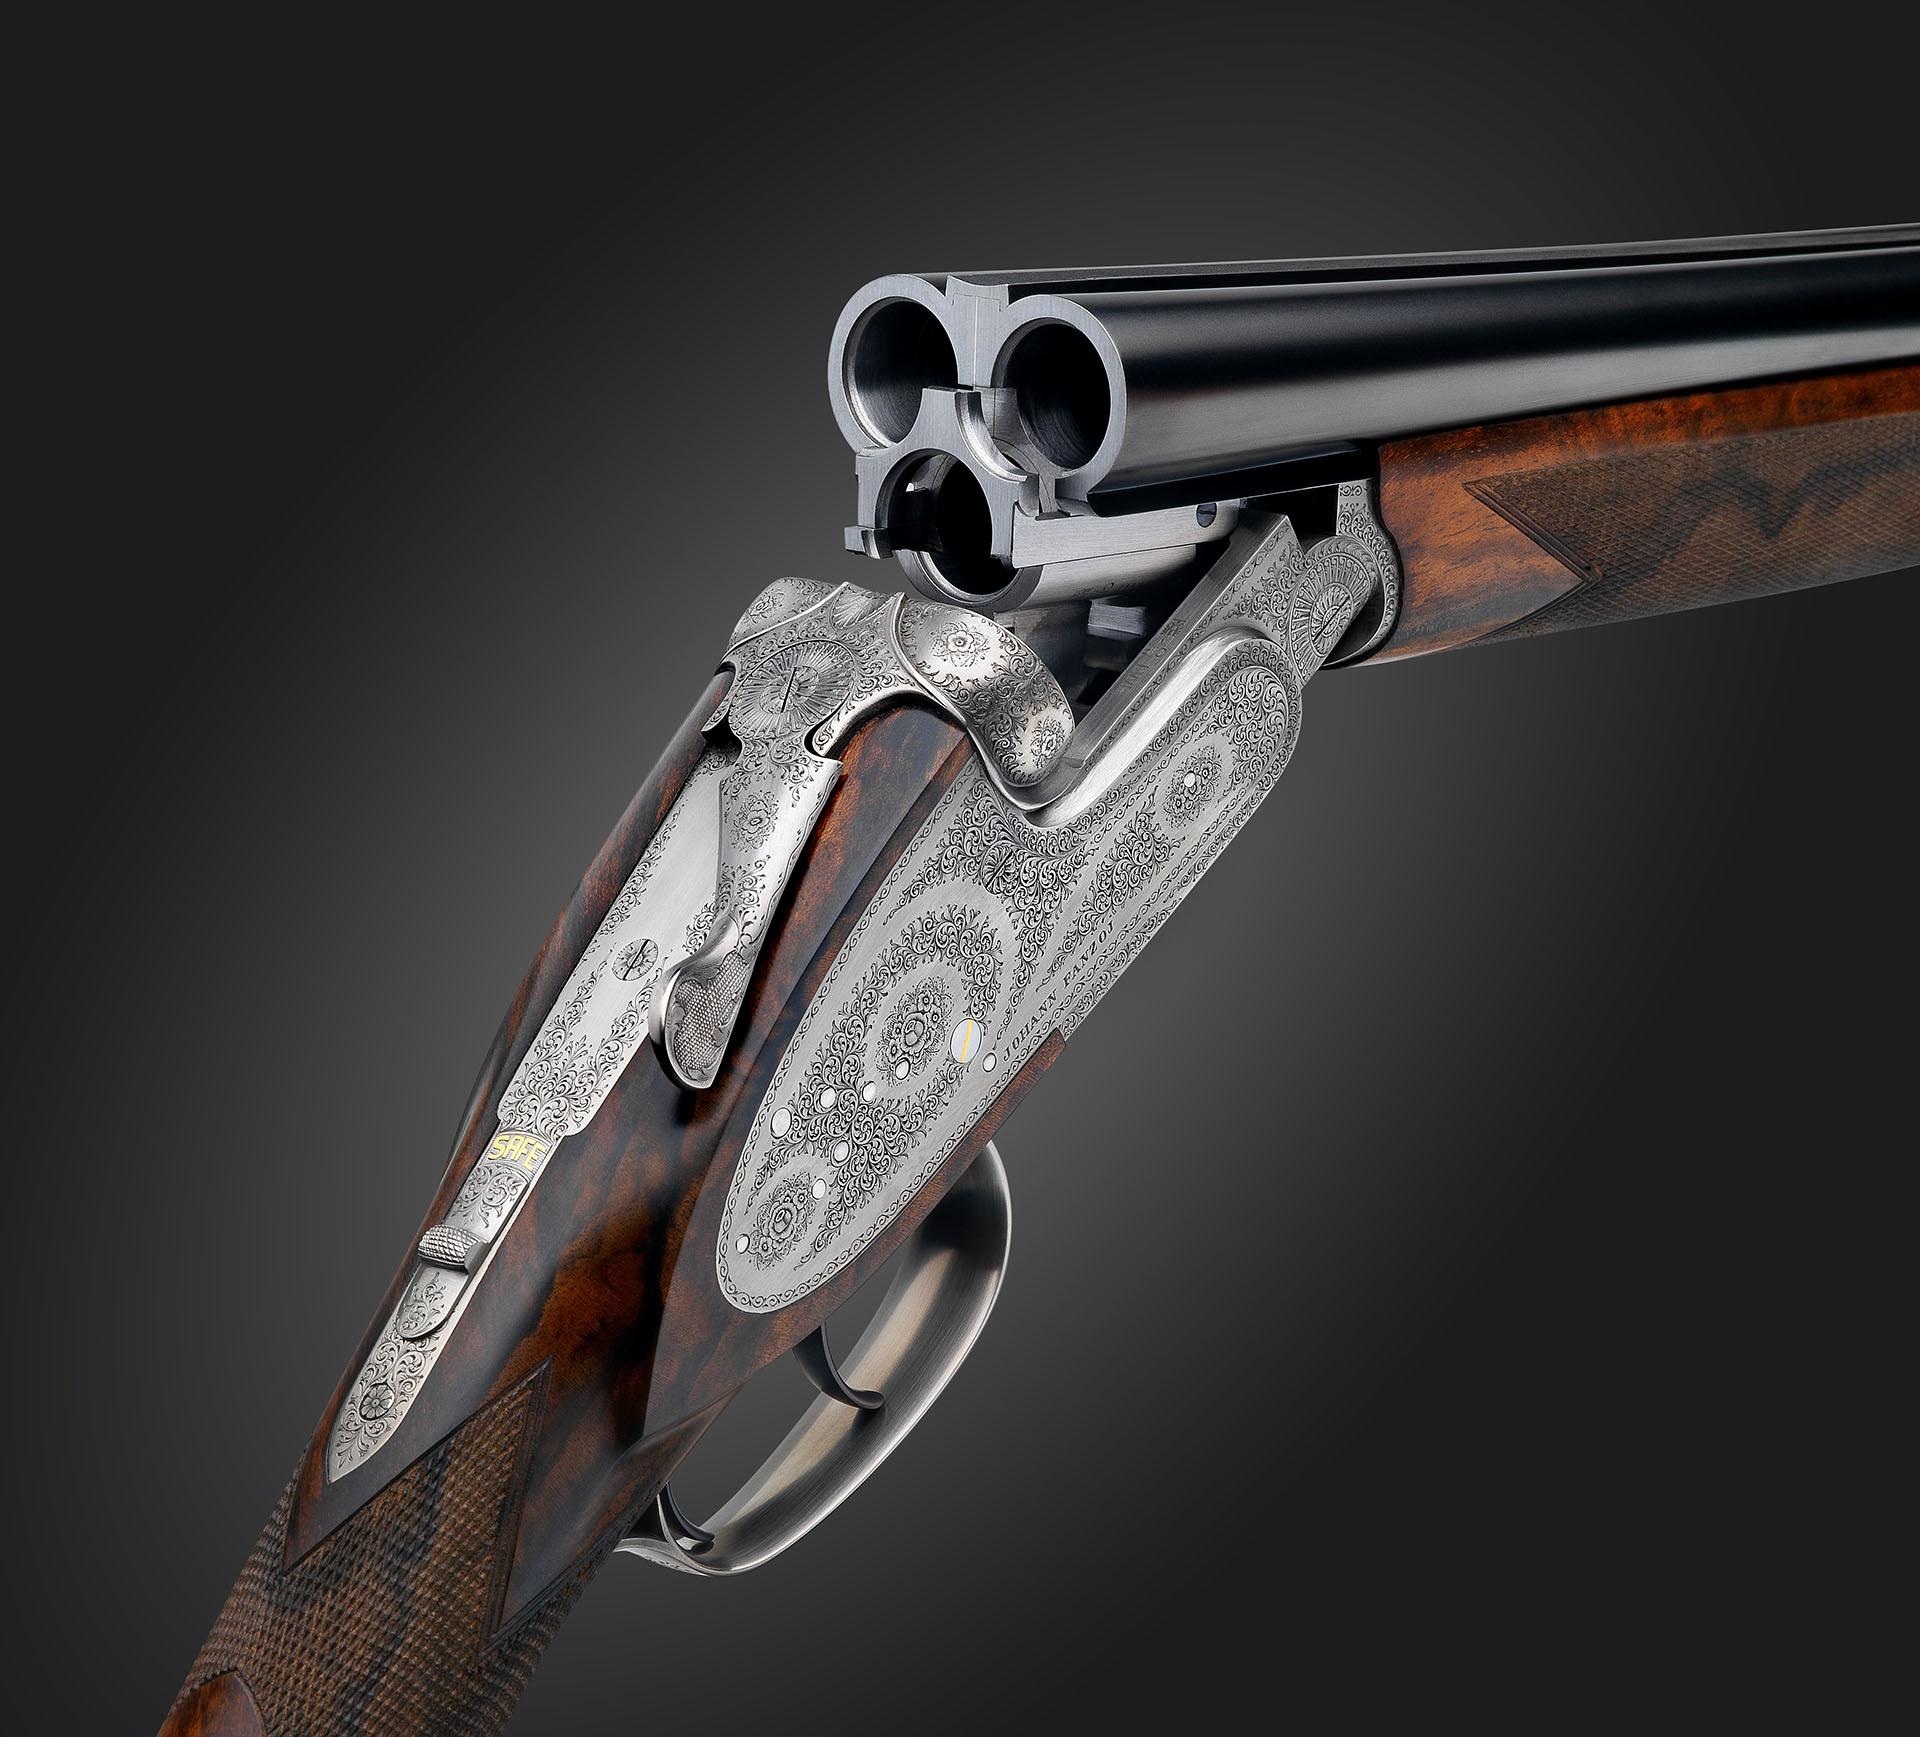 The triple shotgun johann fanzoj a triple barrel gun that shoots with the ease of a double thecheapjerseys Images